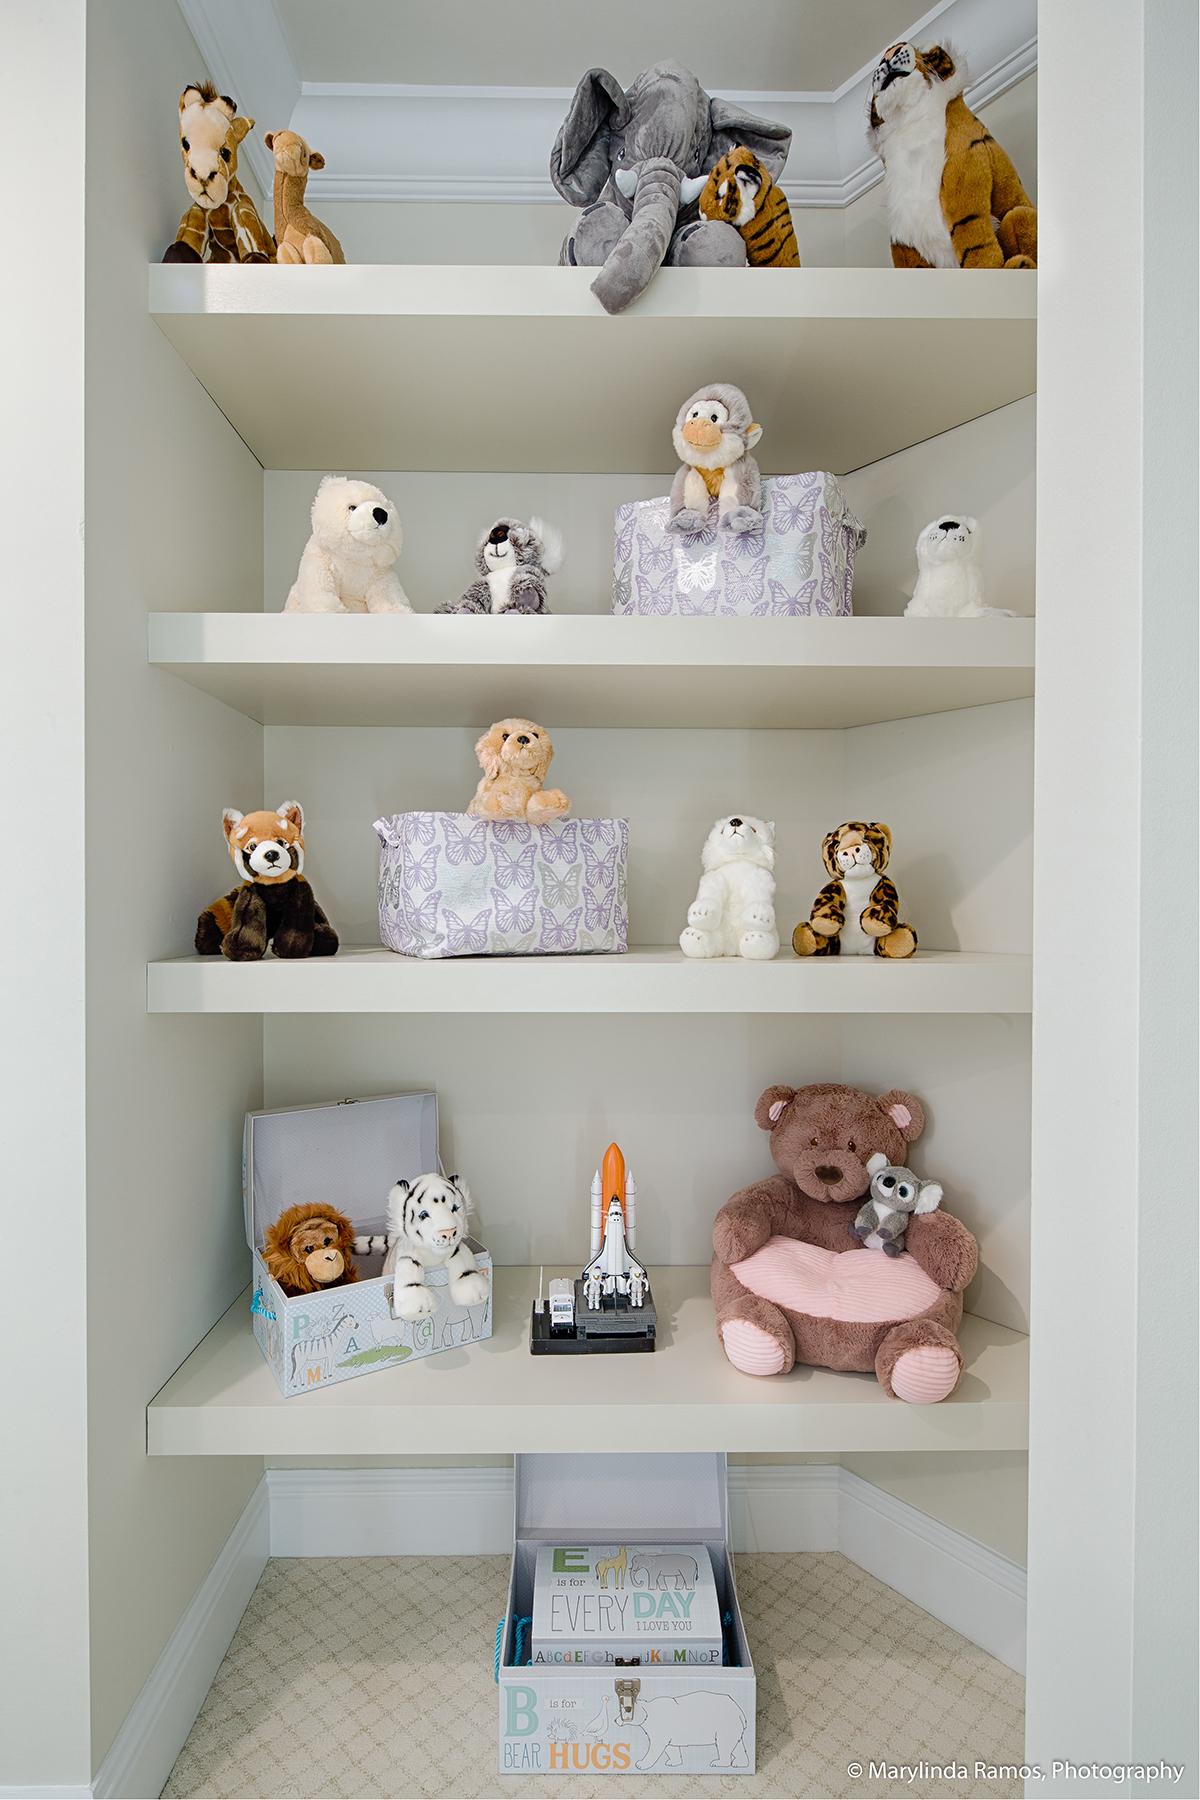 Classic Baby Nursery, Rooms by Eve, Eve Joss, Interior Design in Boca Raton, FL4.jpg